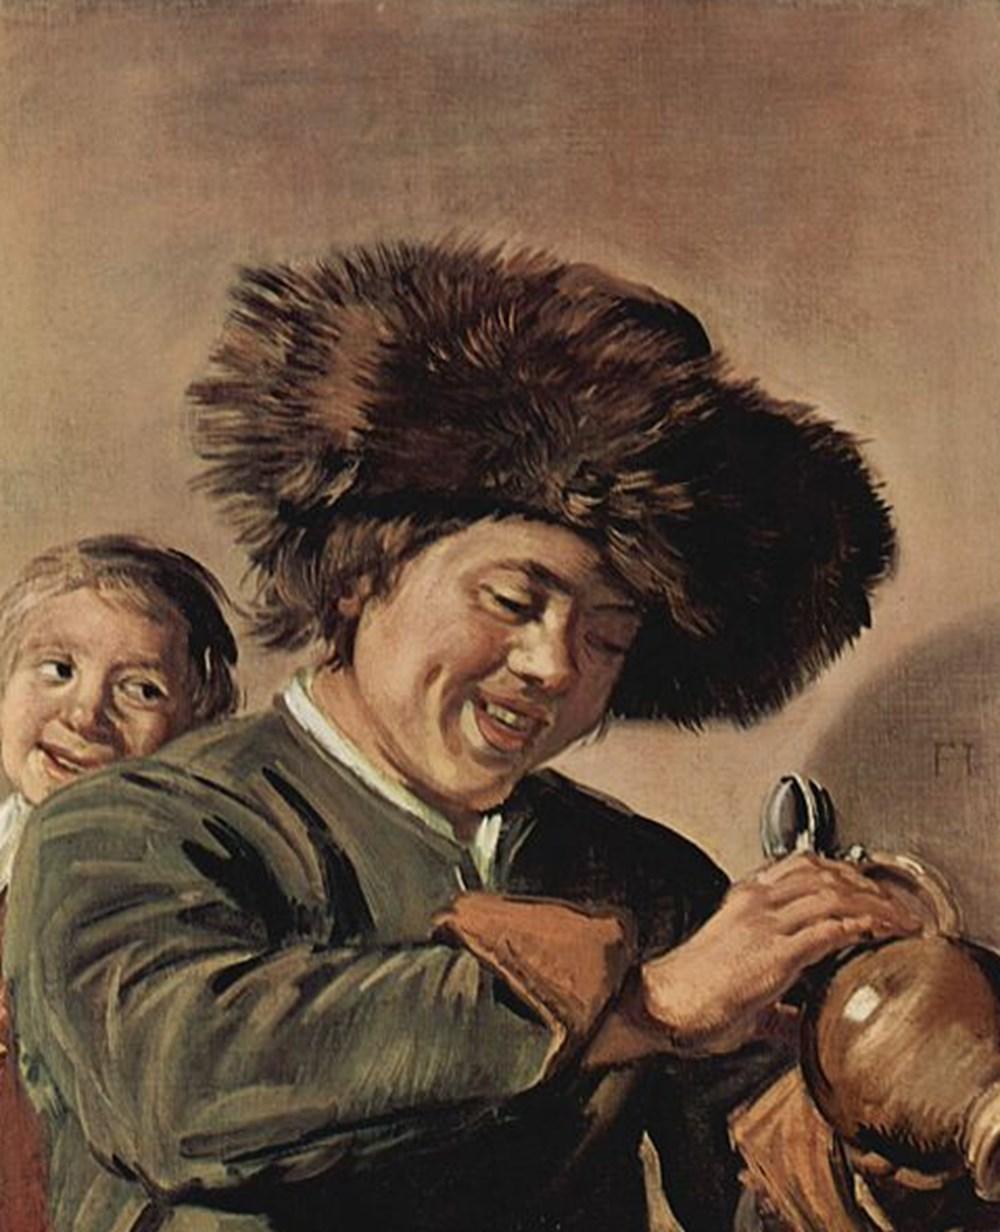 Hollanda'da ressam Frans Hals'a ait İki gülen çocuk tablosu 3. defa çalındı - 2